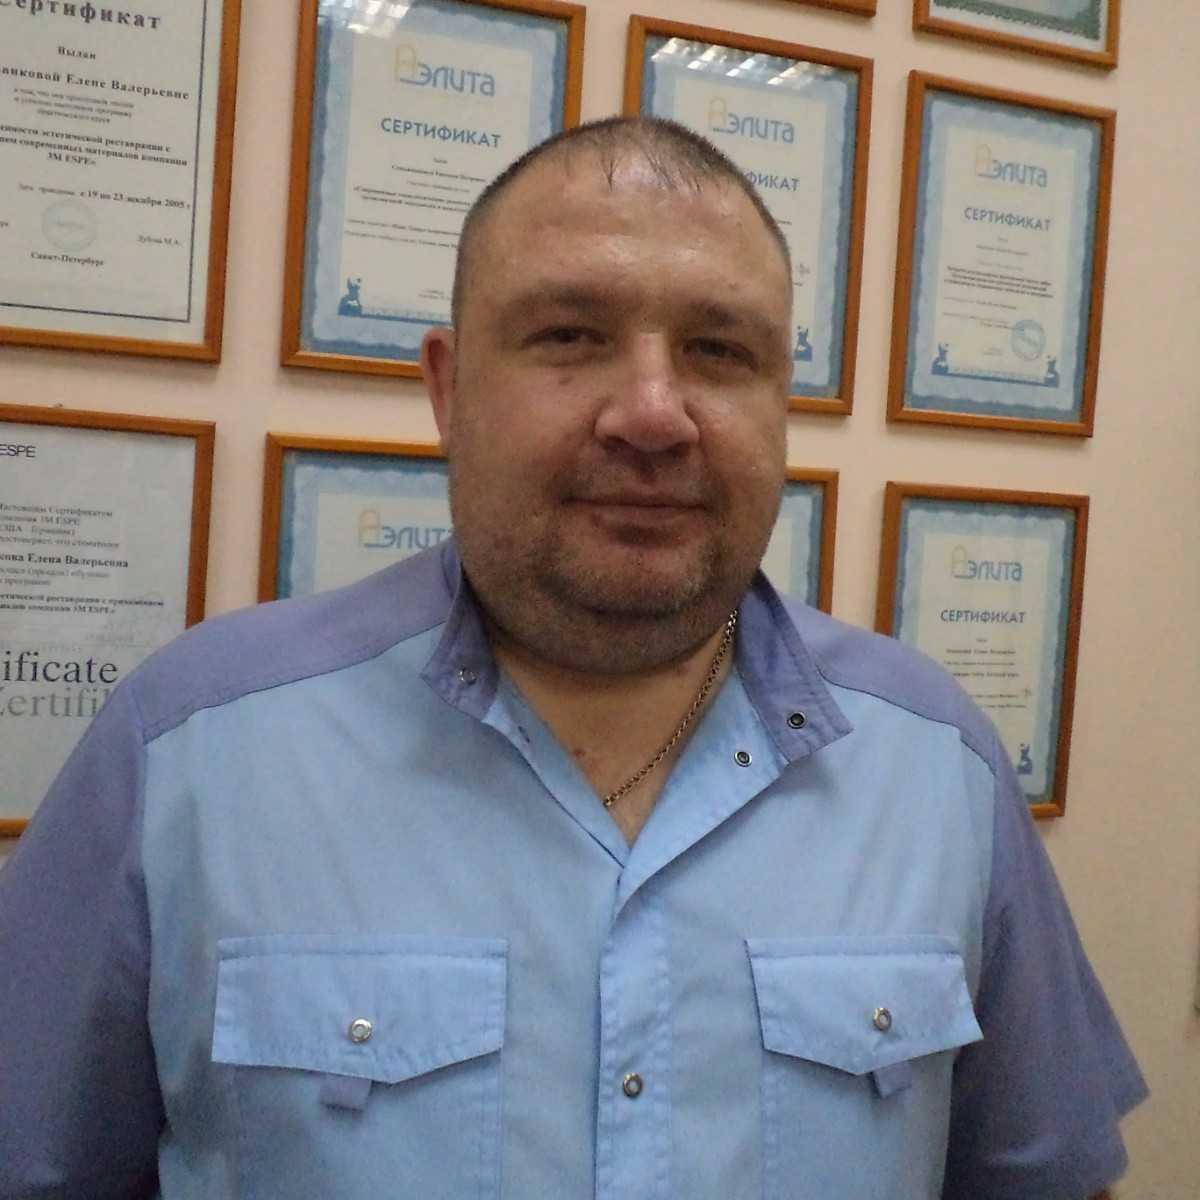 Попов Сергей Александрович - фотография